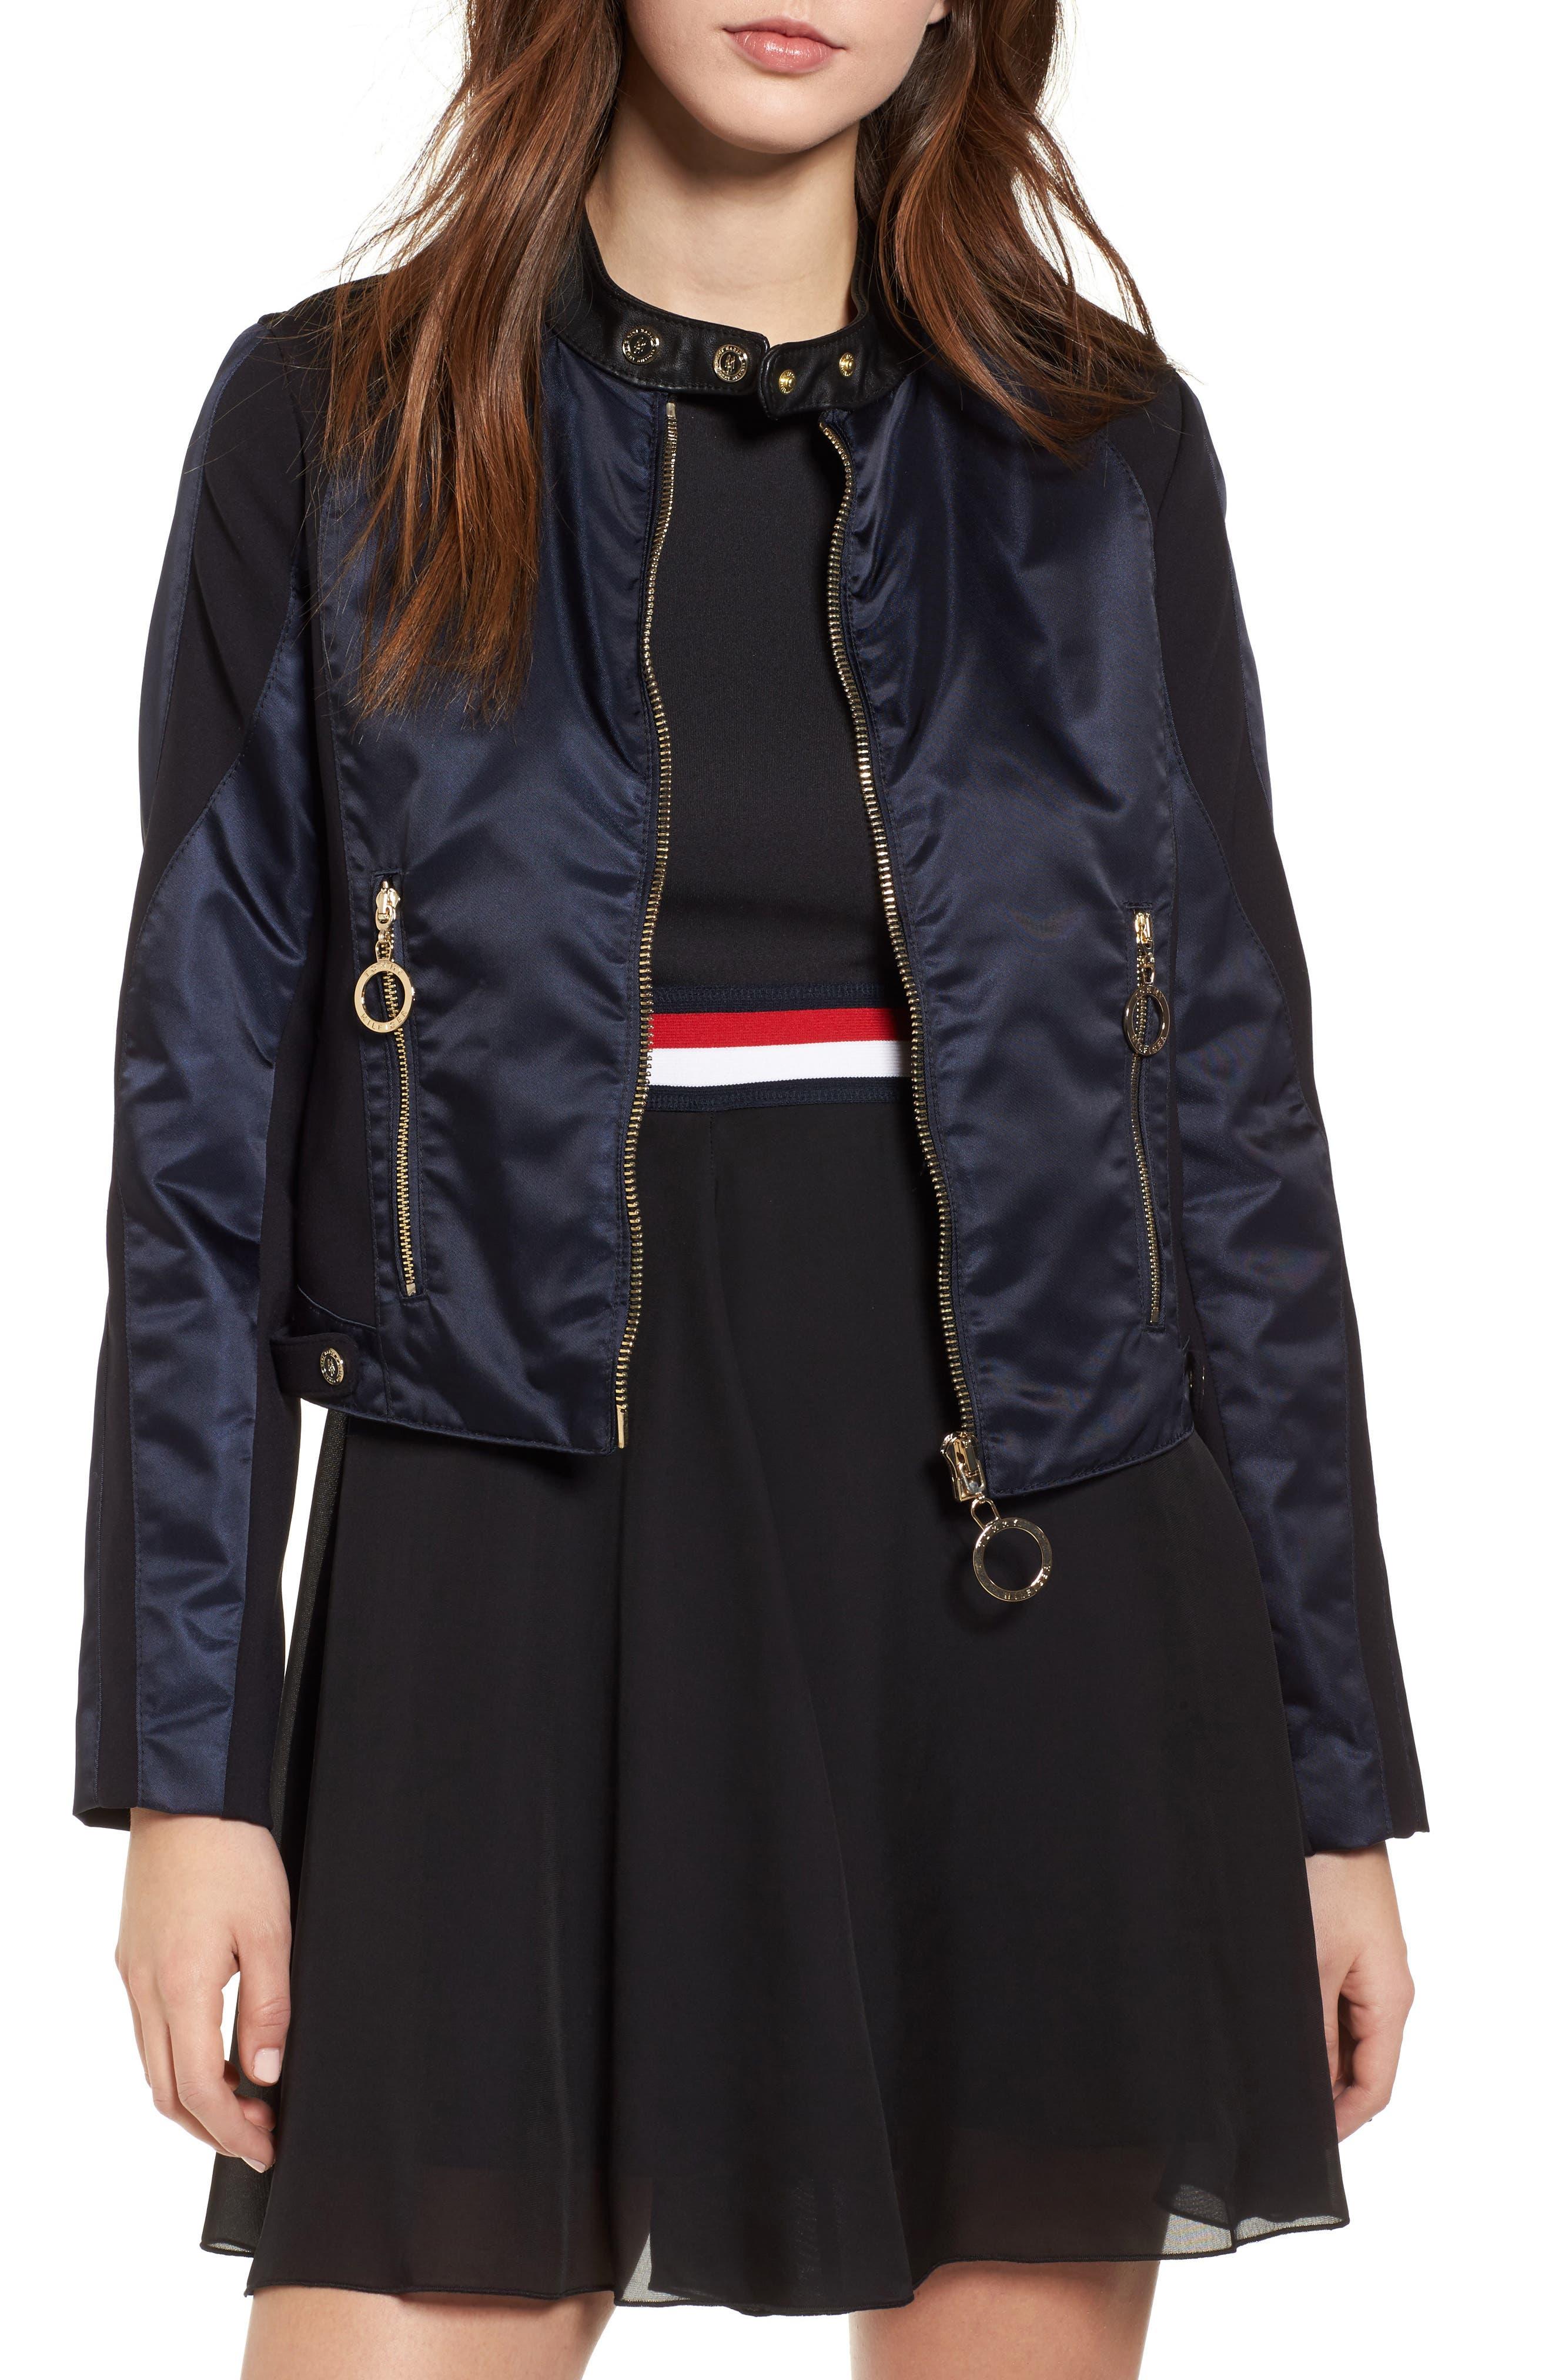 TOMMY JEANS x Gigi Hadid Nylon Moto Jacket